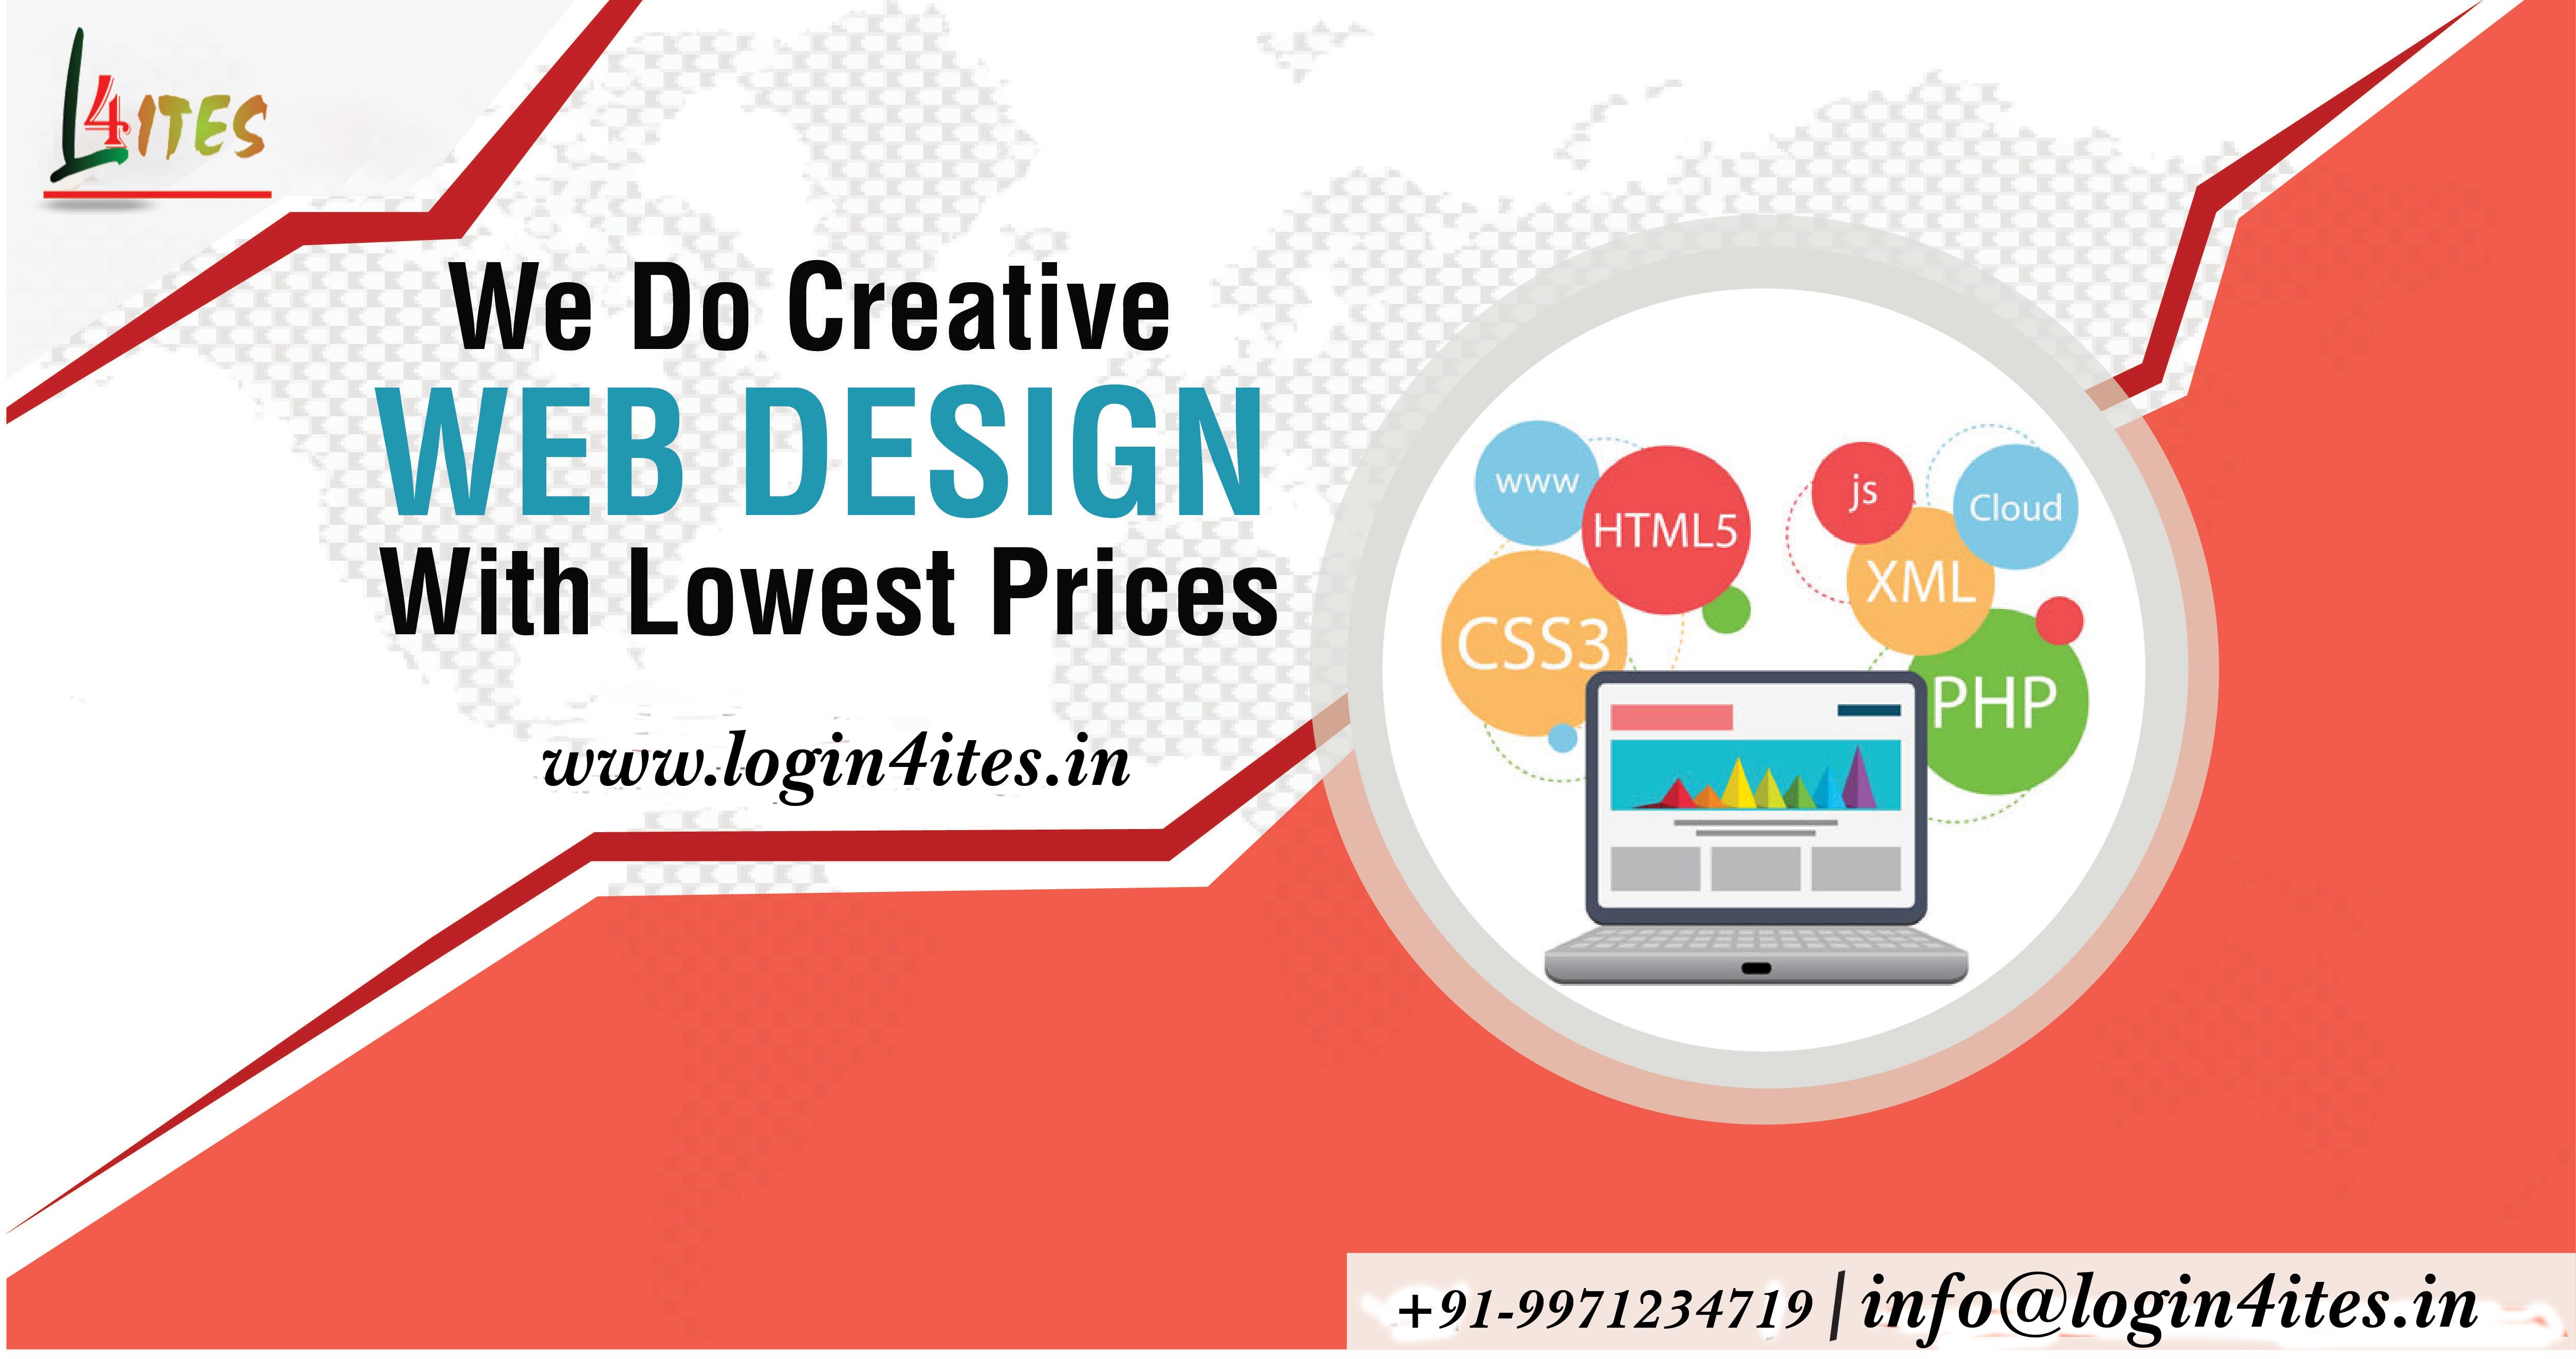 Pin By Ankurrajput On Login4ites Web Design Company Web Design Website Design Company